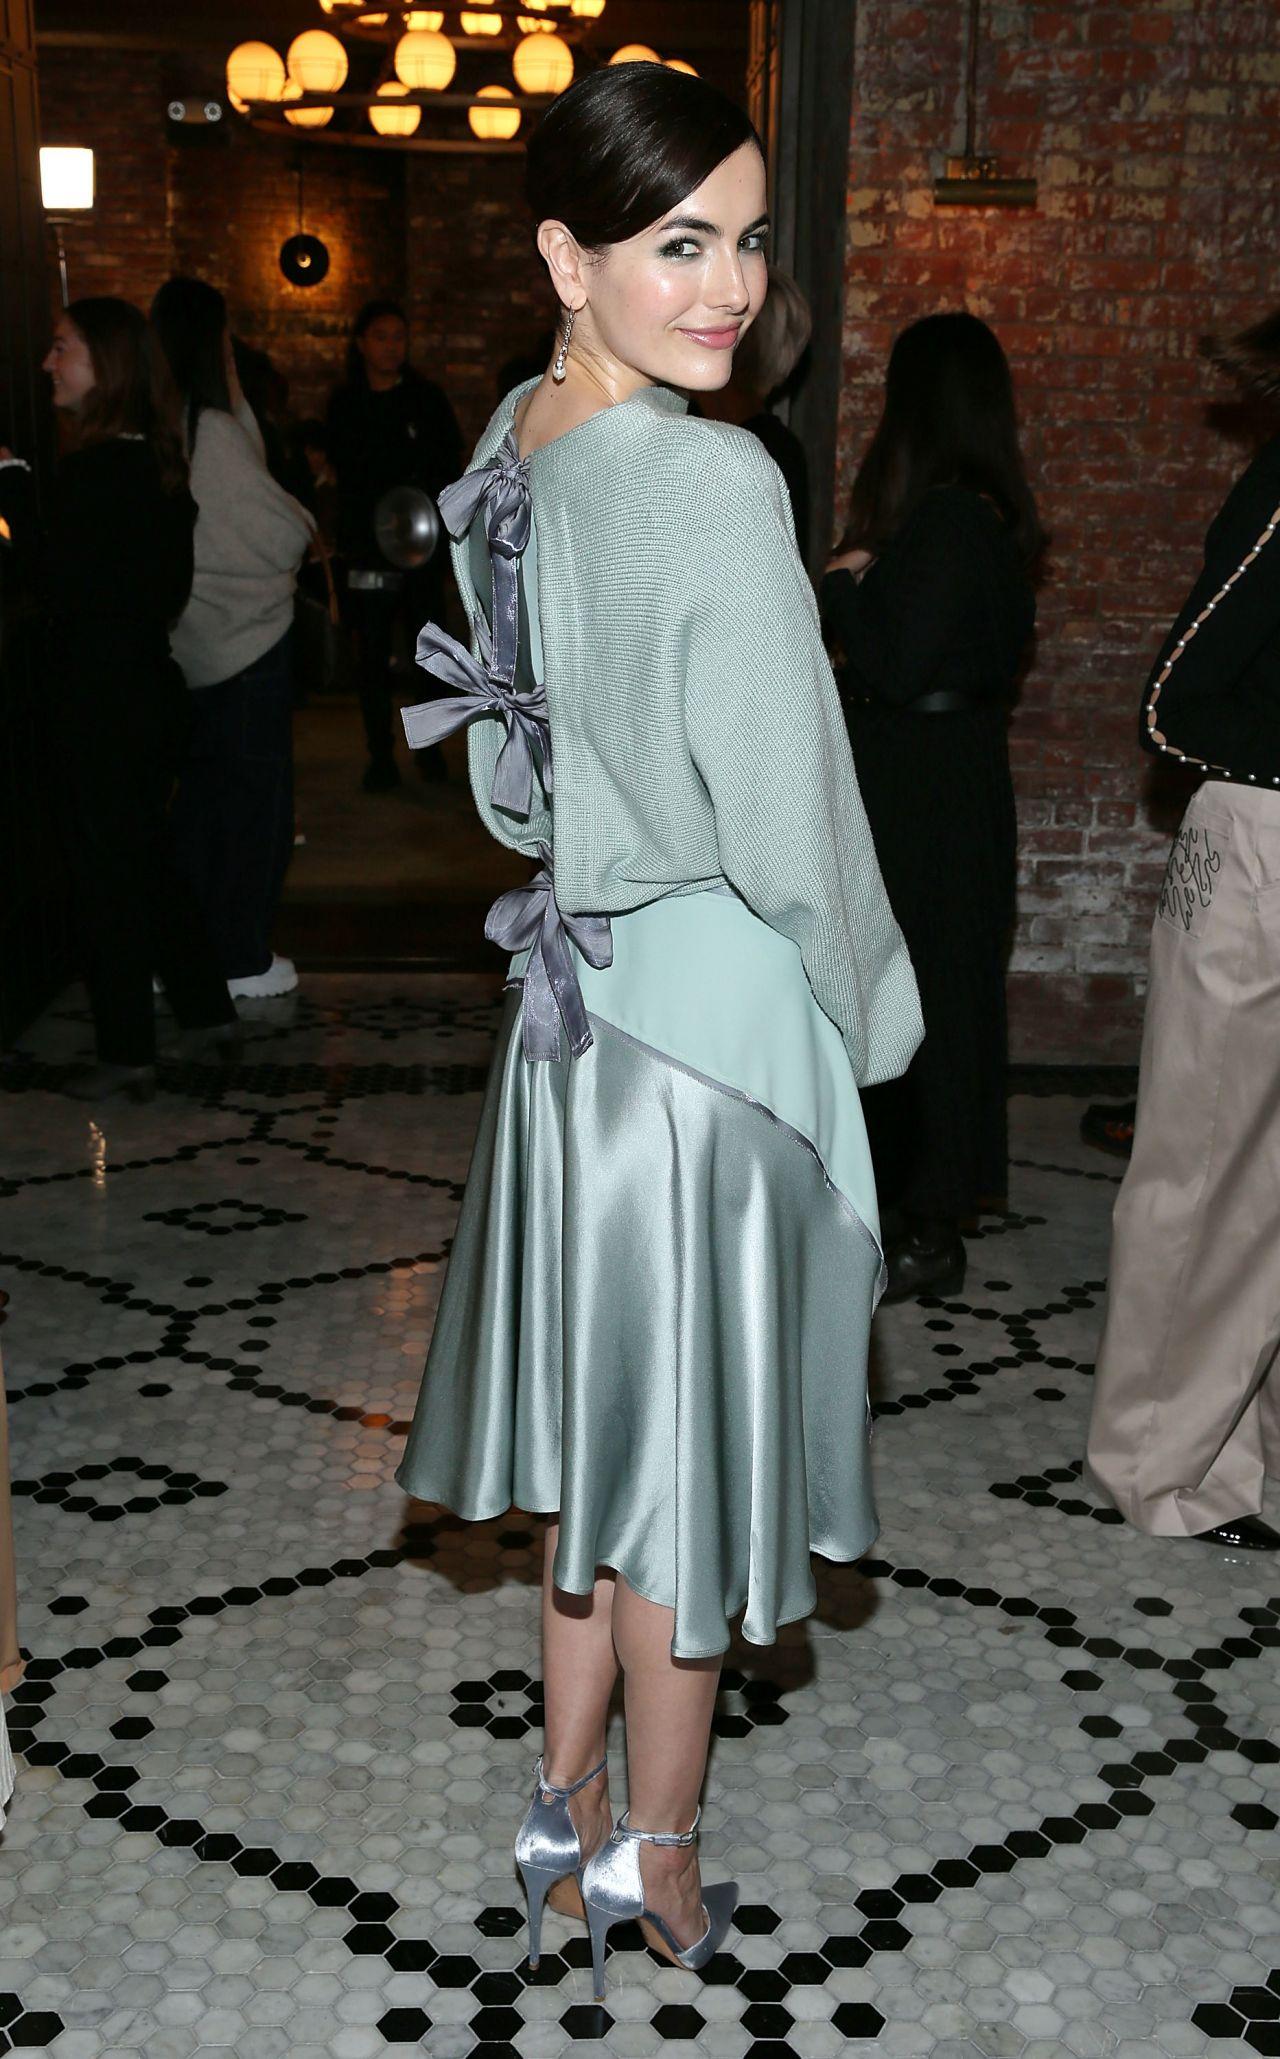 http://celebmafia.com/wp-content/uploads/2018/02/camilla-belle-adeam-fashion-show-at-new-york-fashion-week-02-08-2018-0.jpg